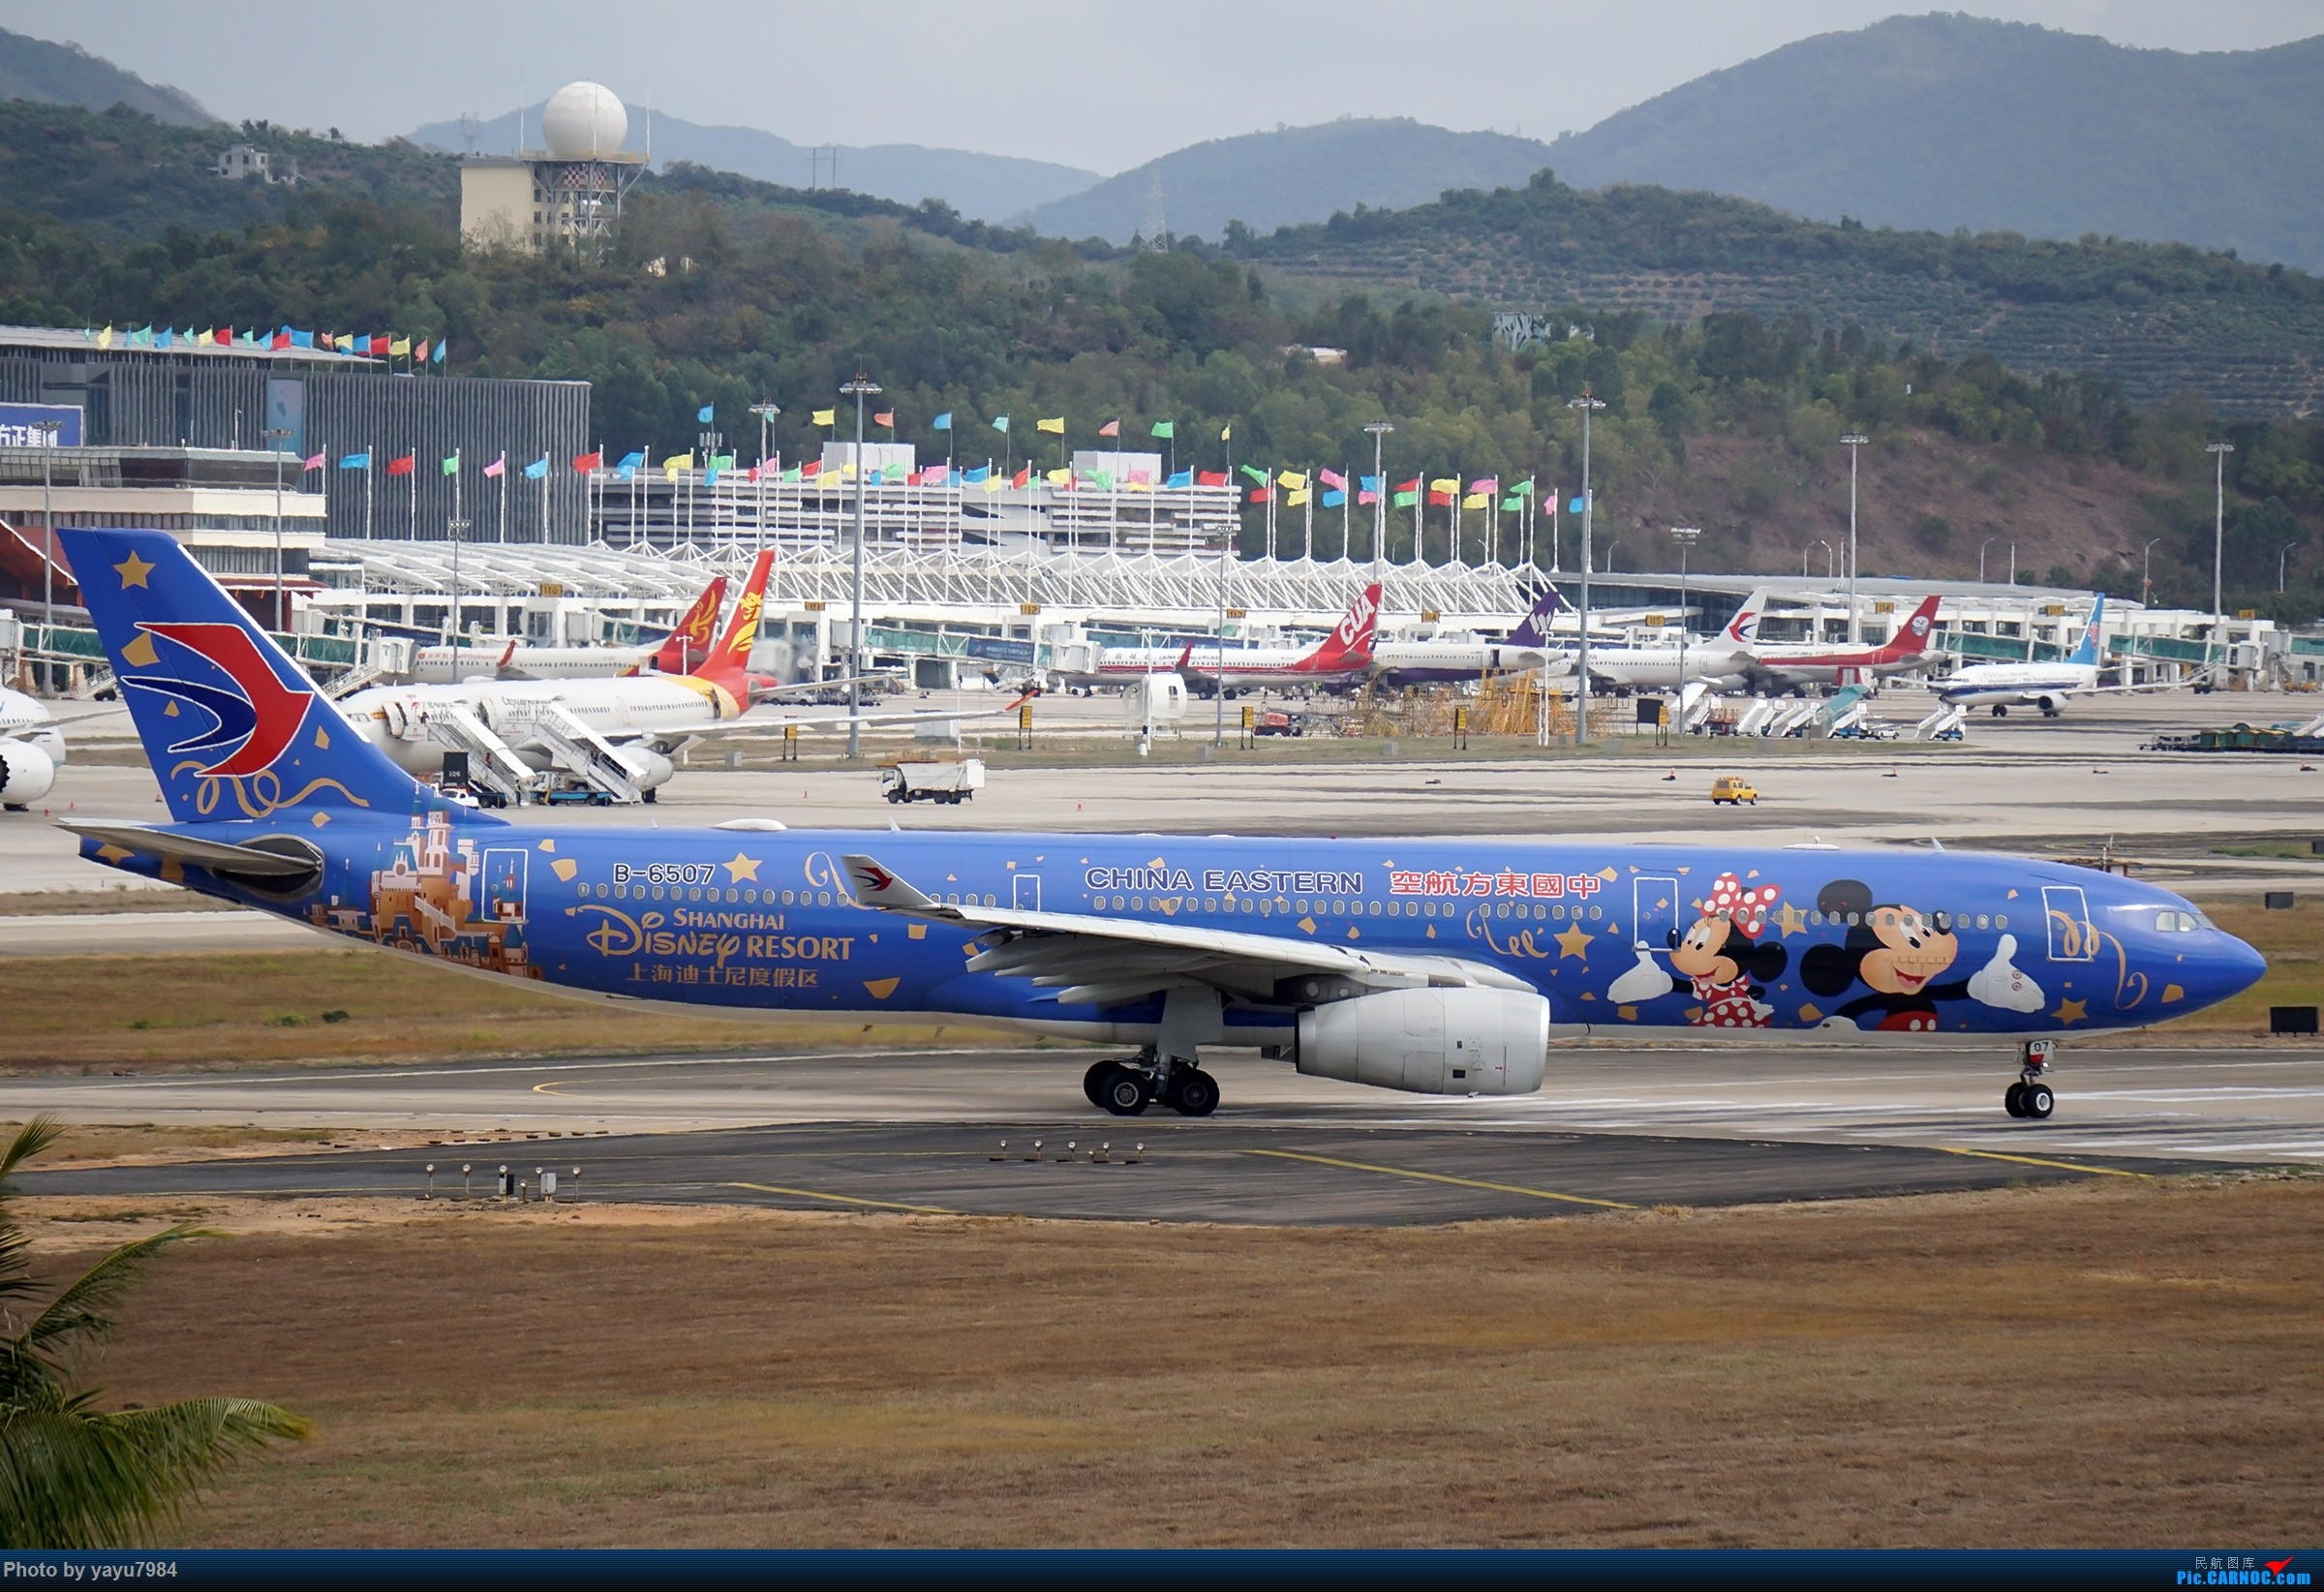 Re:[原创][SYX] 回国首拍,春运高峰时段的三亚凤凰国际机场 AIRBUS A330-300 B-6507 中国三亚凤凰国际机场